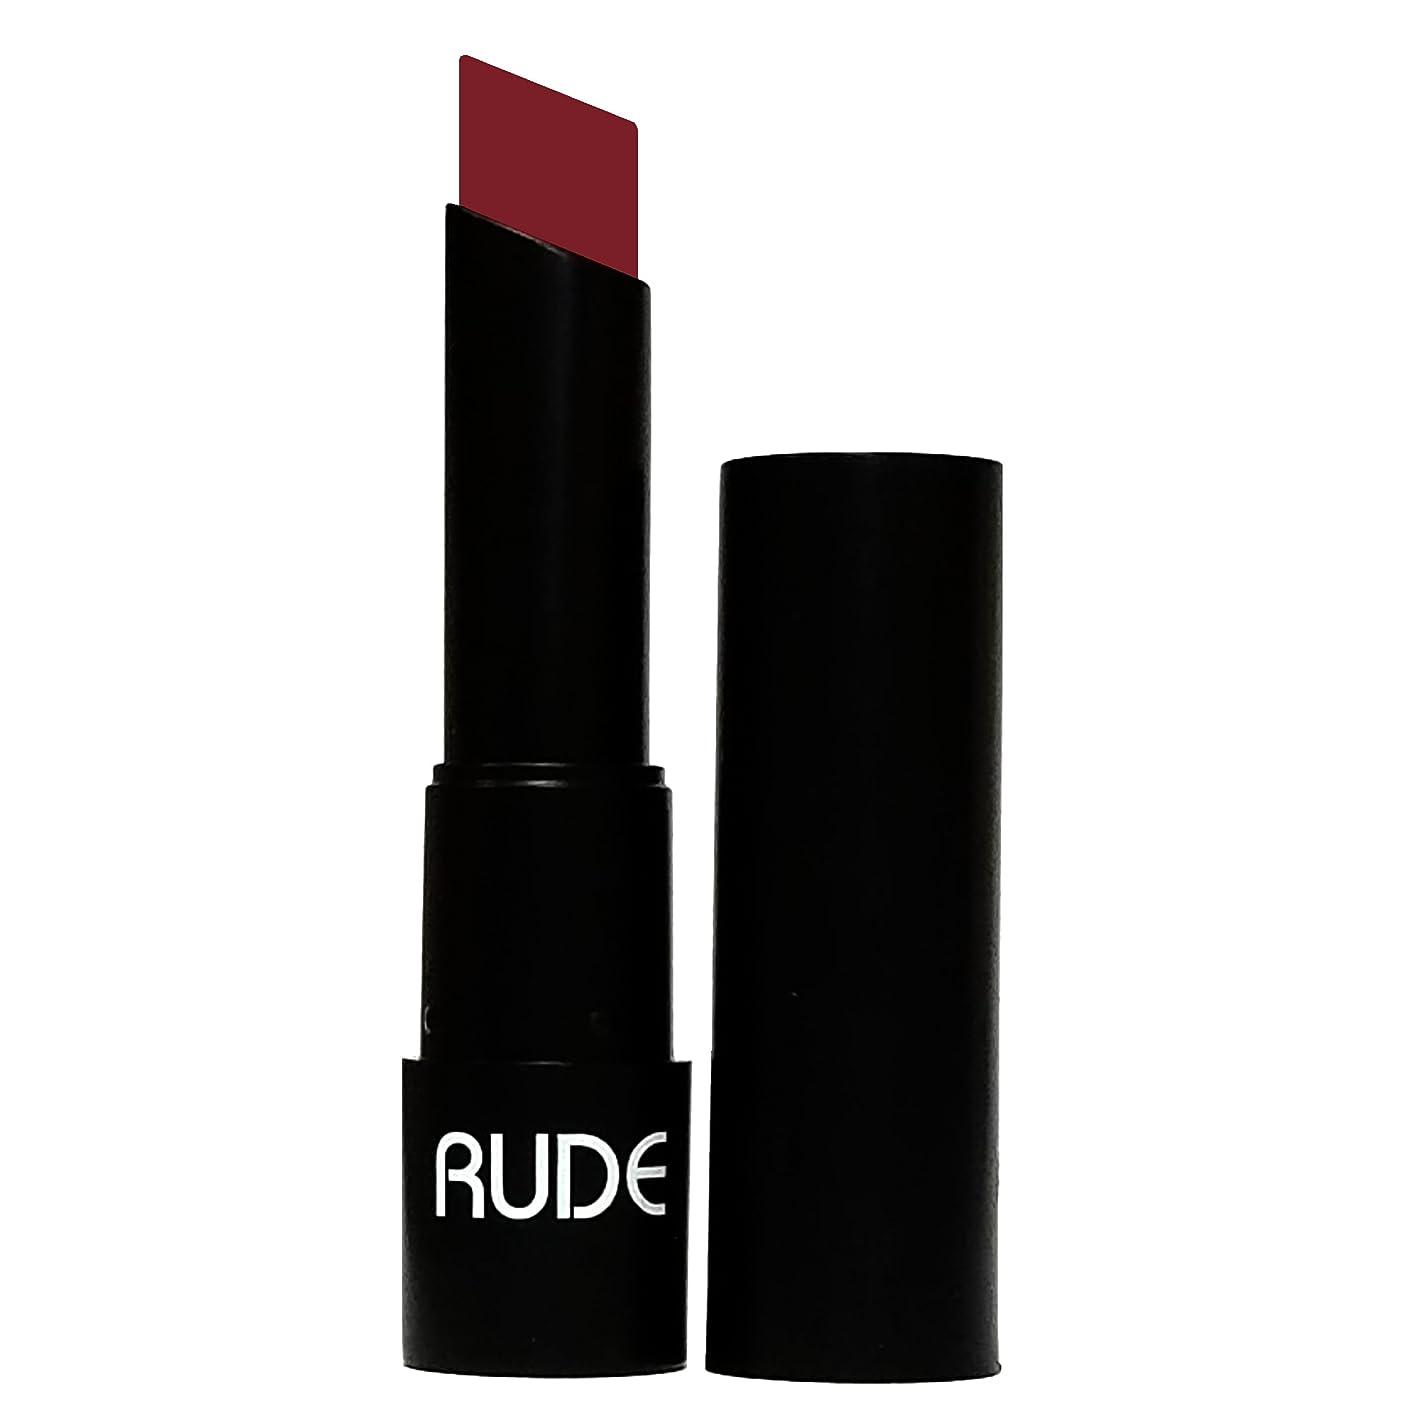 化石形成万歳(3 Pack) RUDE Attitude Matte Lipstick - Snooty (並行輸入品)